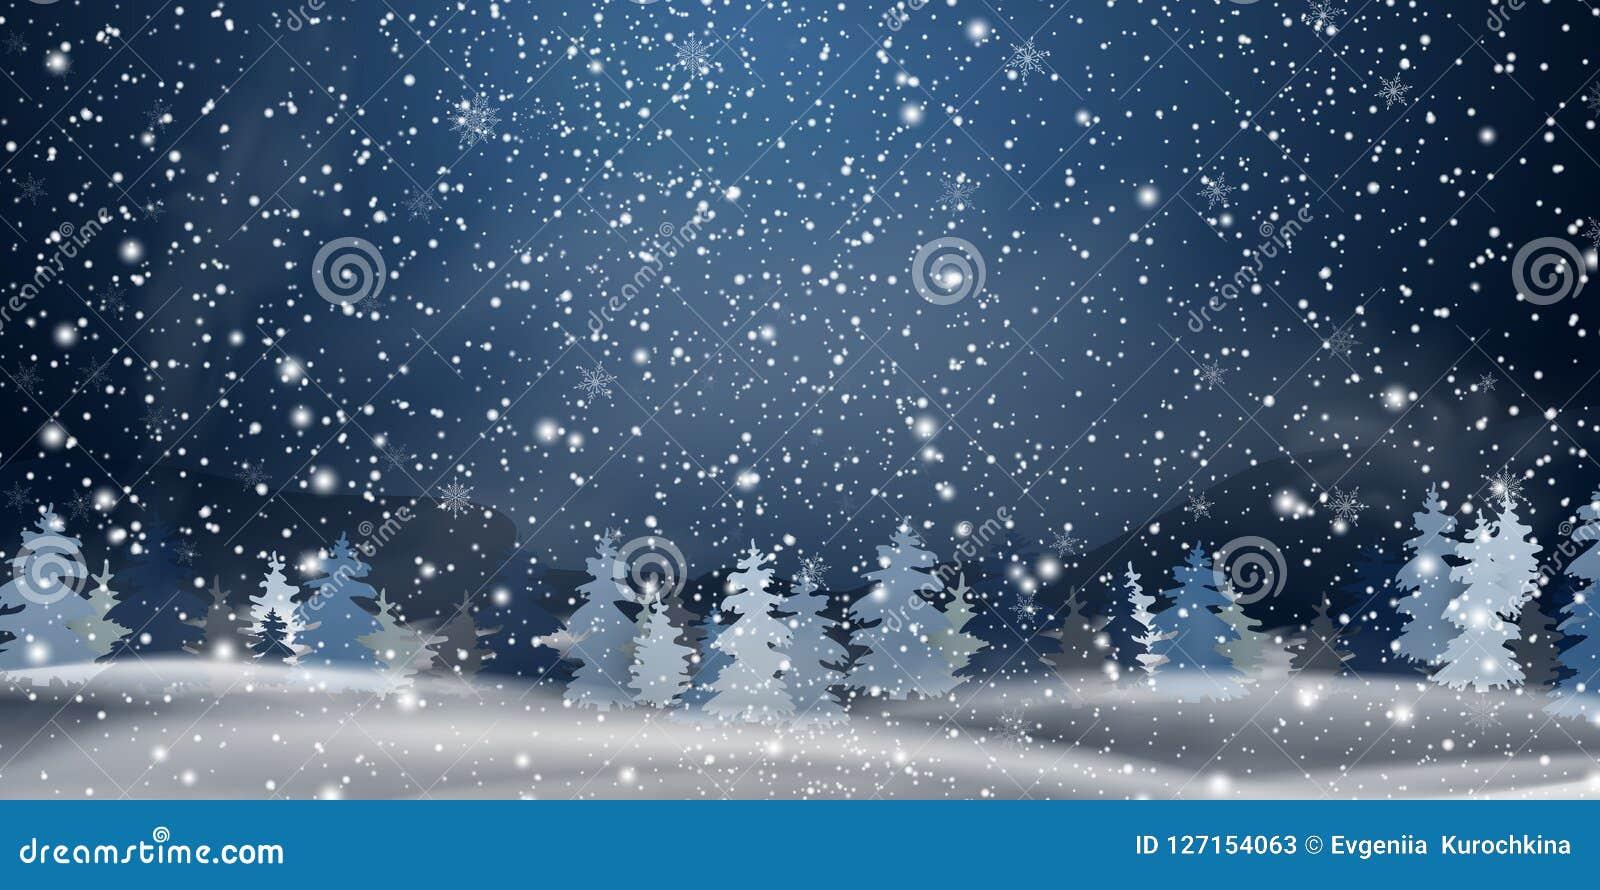 Snowing Christmas Scene.Christmas Night Snowy Woodland Landscape Winter Background